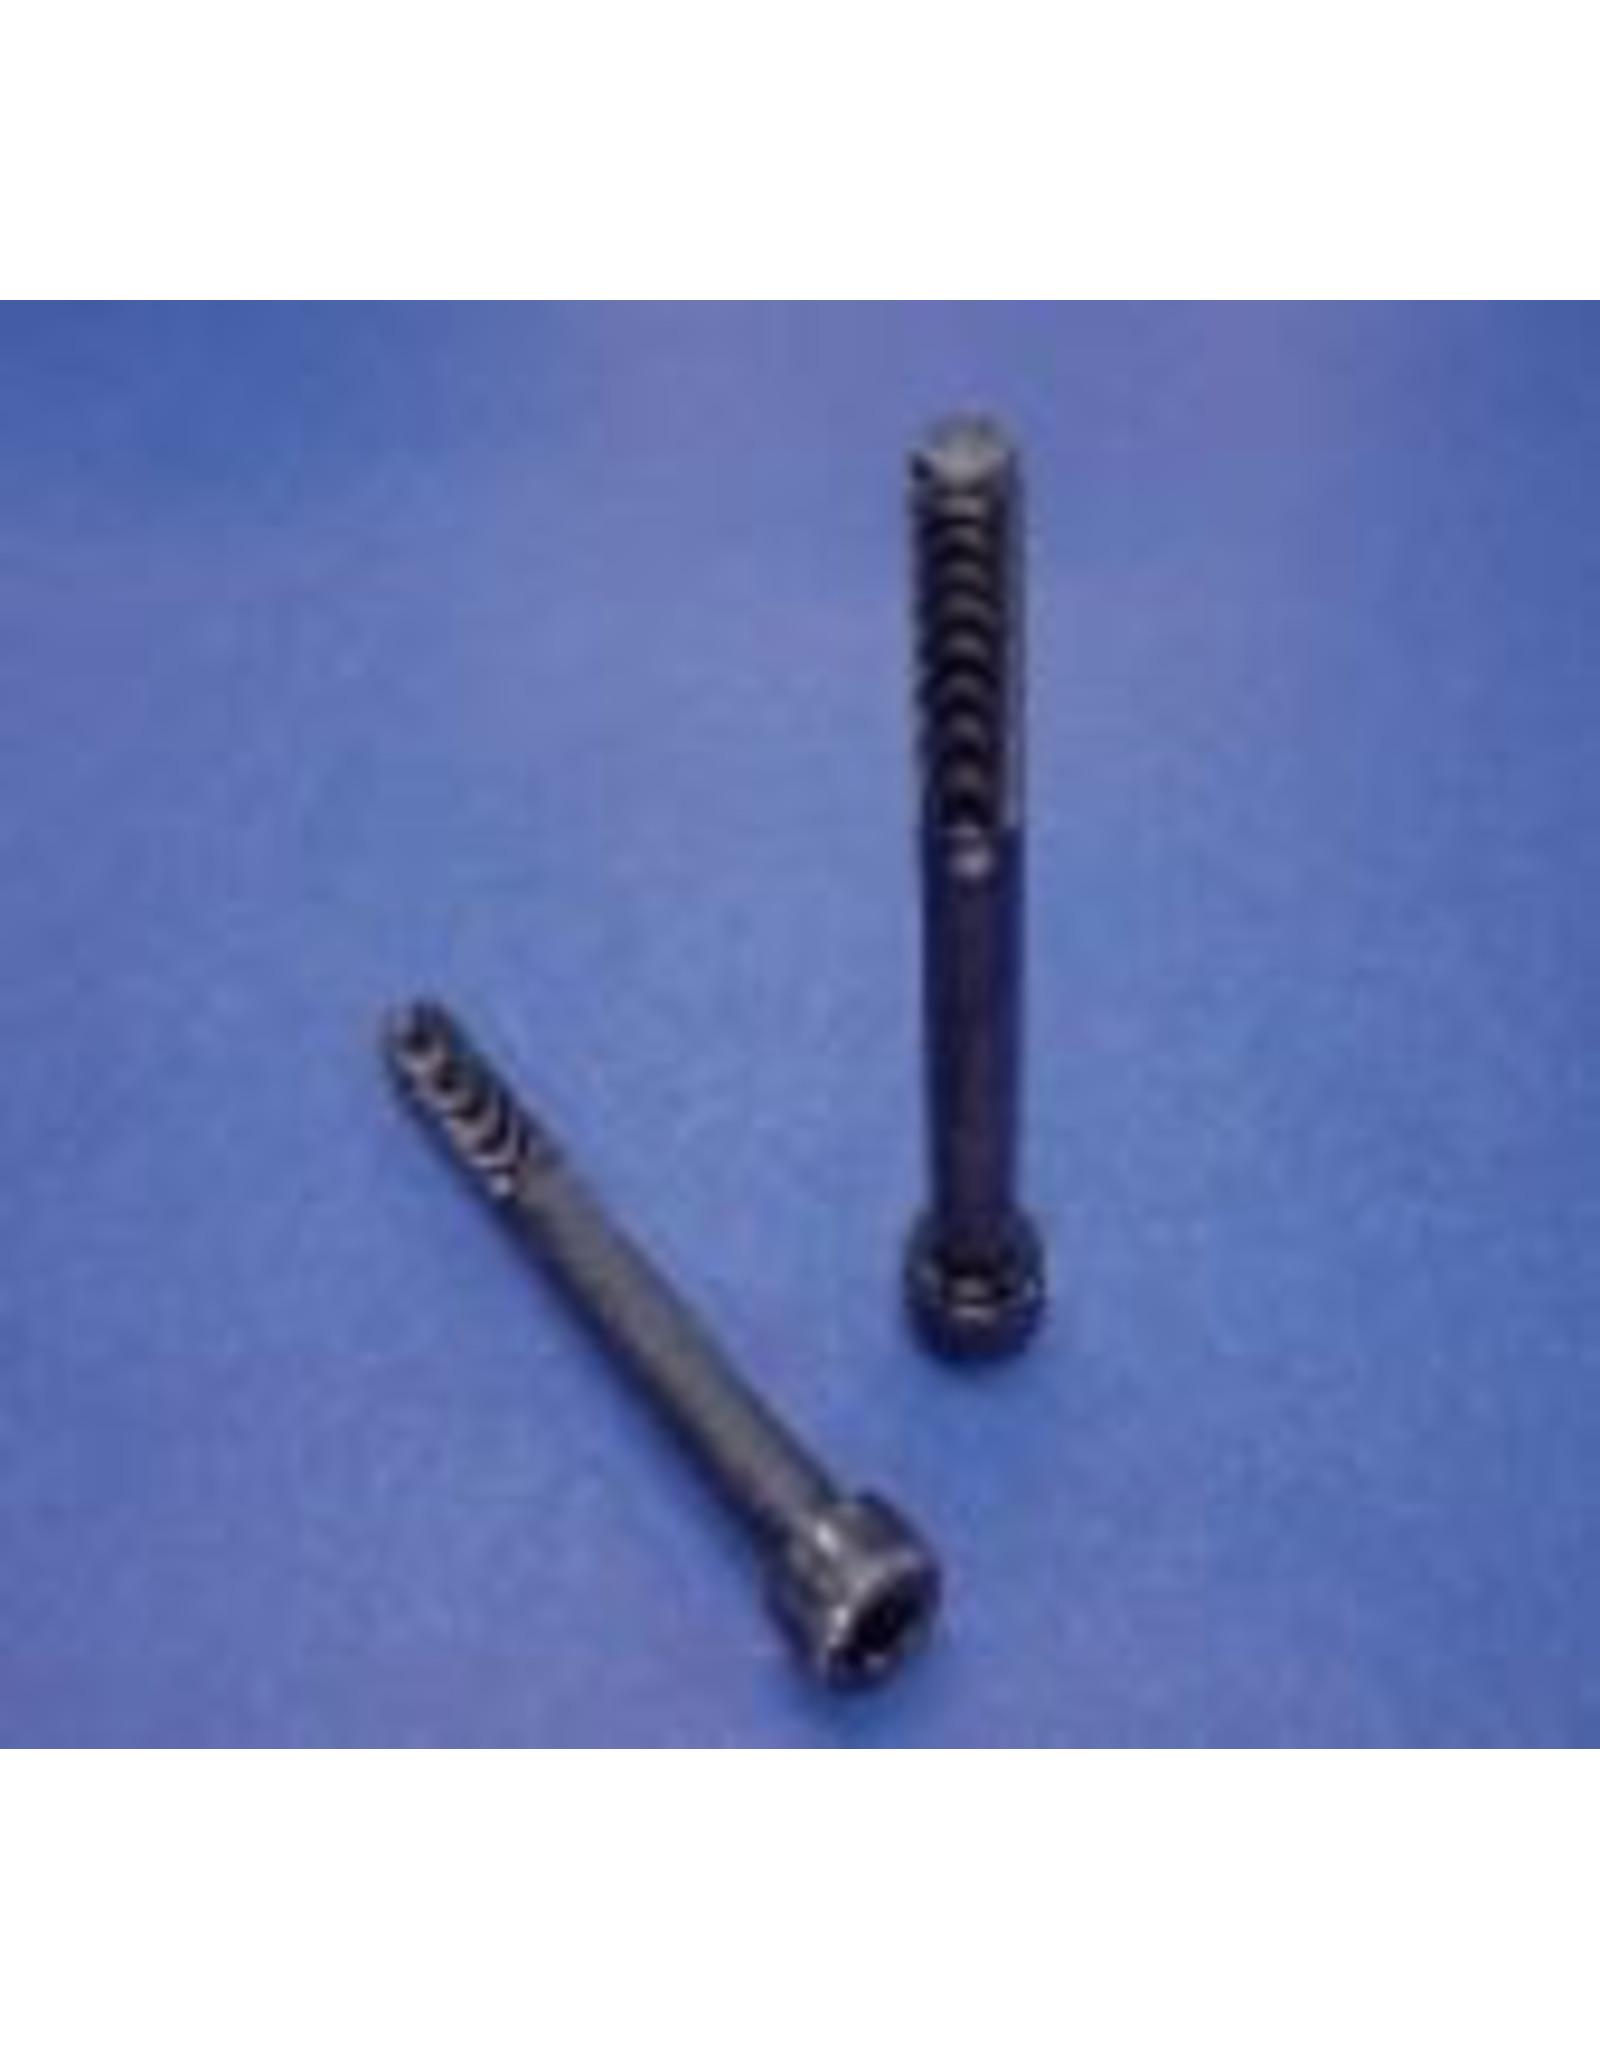 KMT Style SHCS, M10 x 1.5 x 85mm, GR8